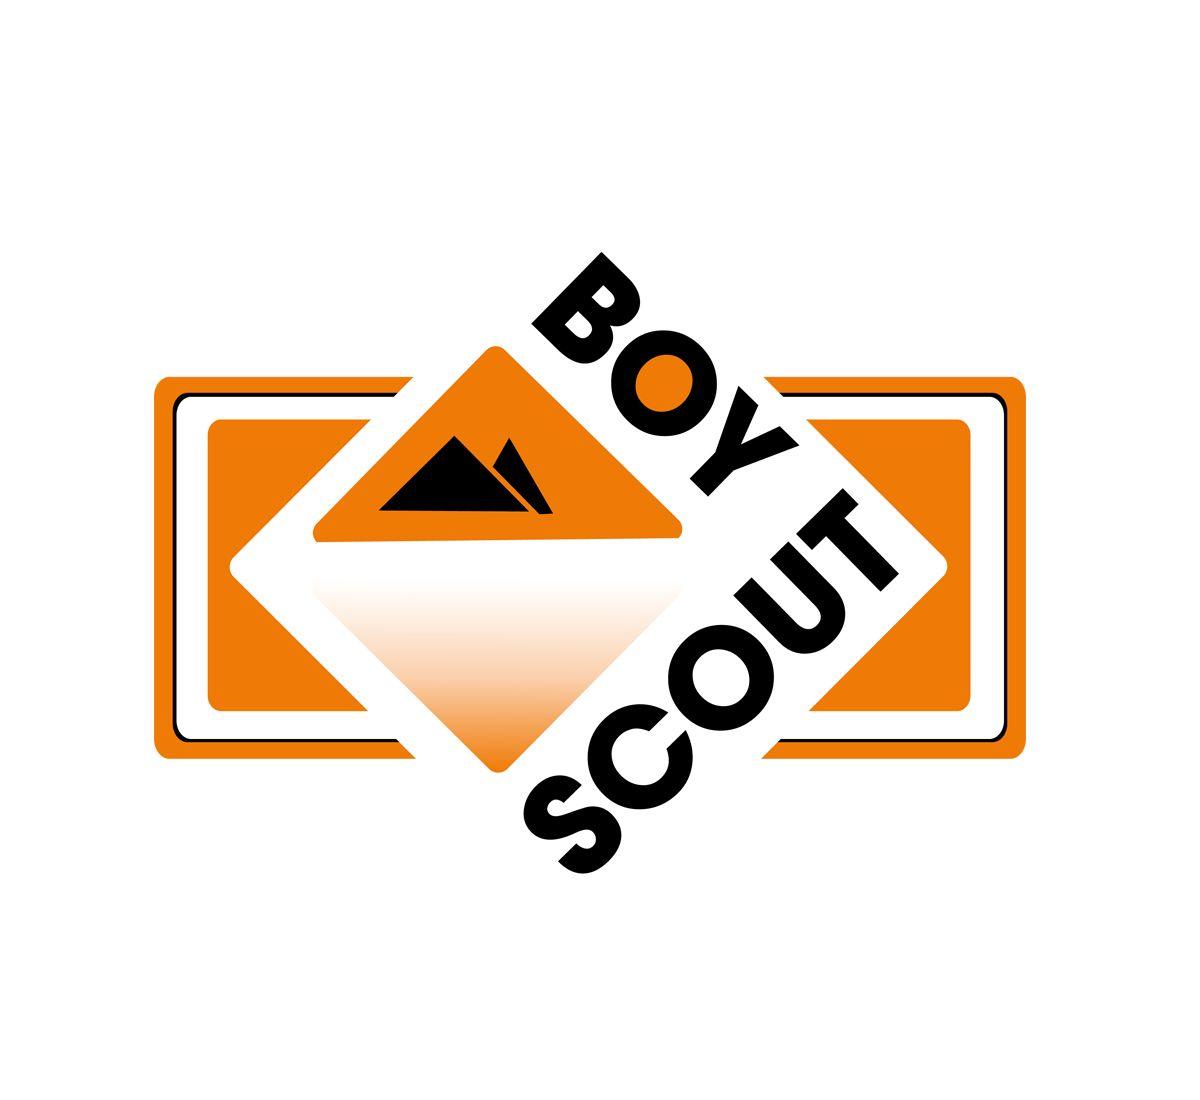 Логотип для сайта интернет-магазина BOY SCOUT - дизайнер gallenochka